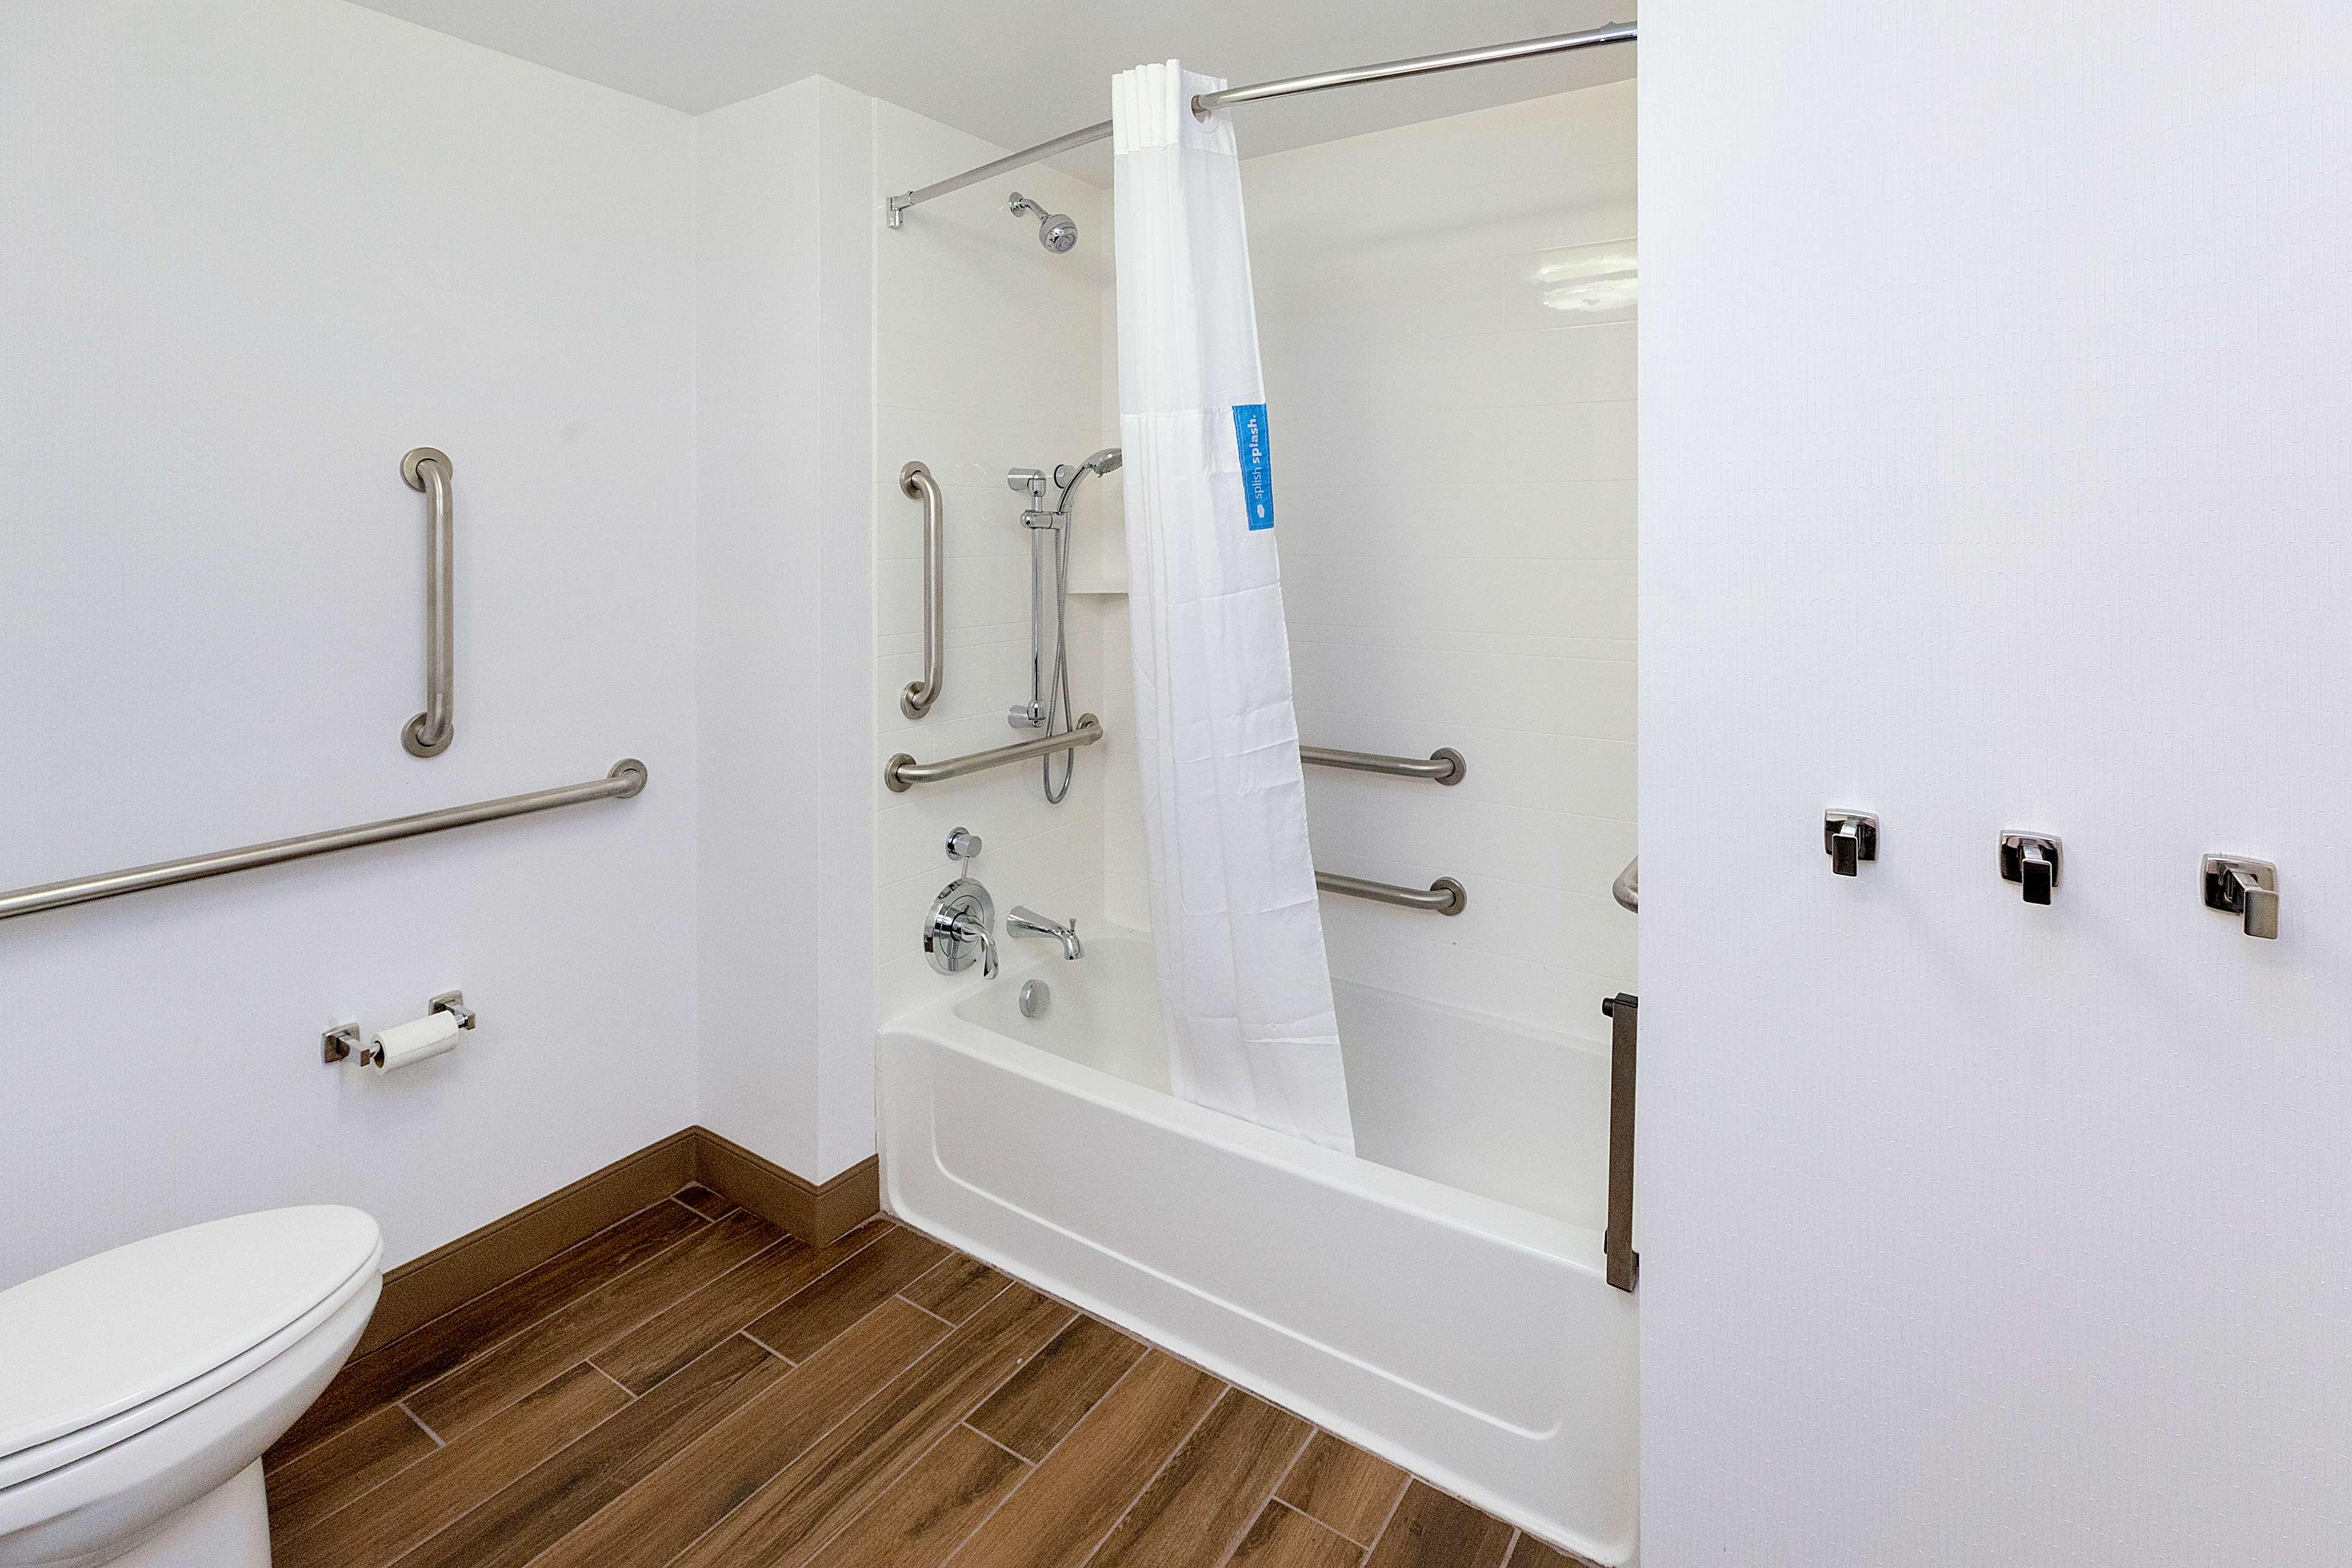 Hampton Inn & Suites Morgantown / University Town Centre image 16